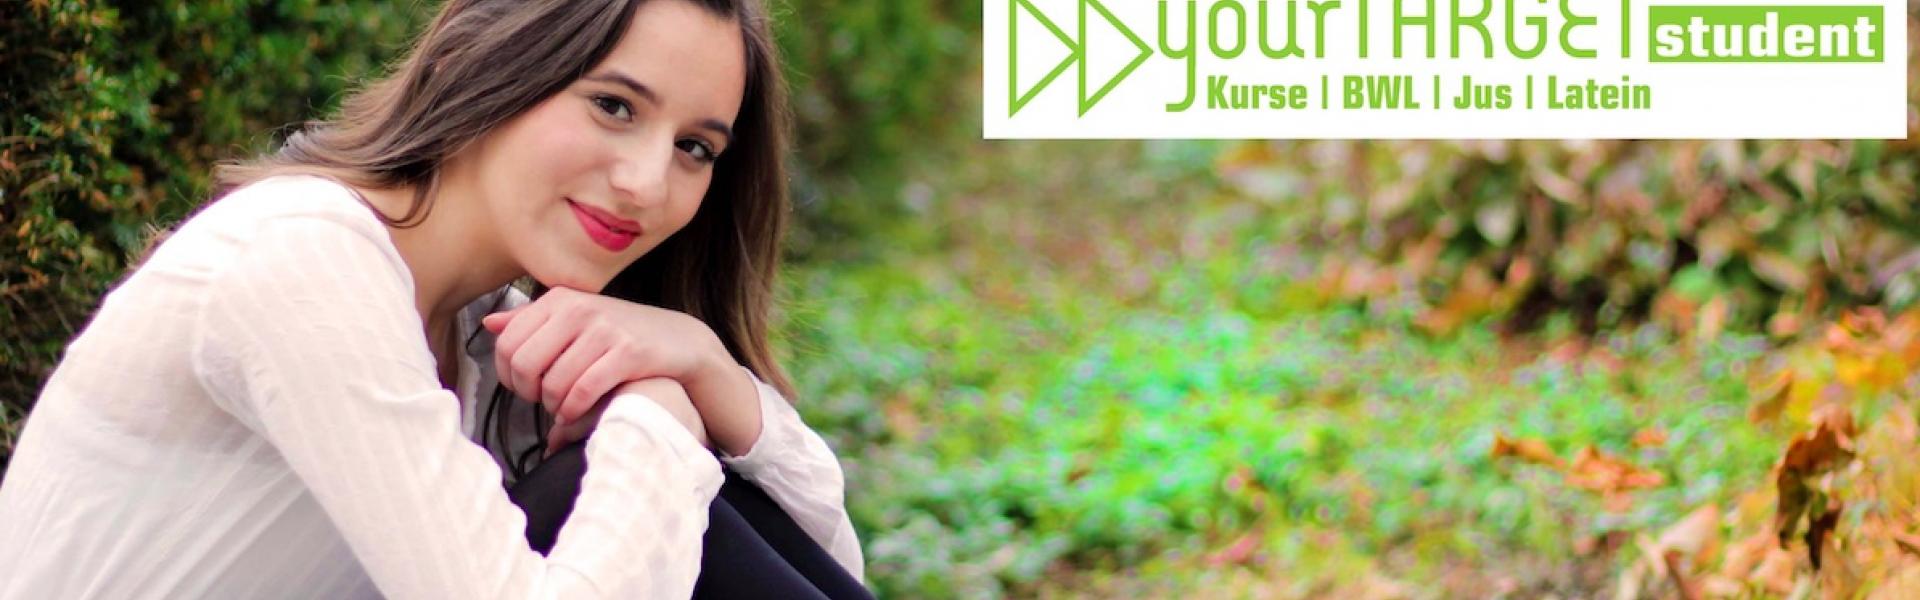 Laura Zlami cover